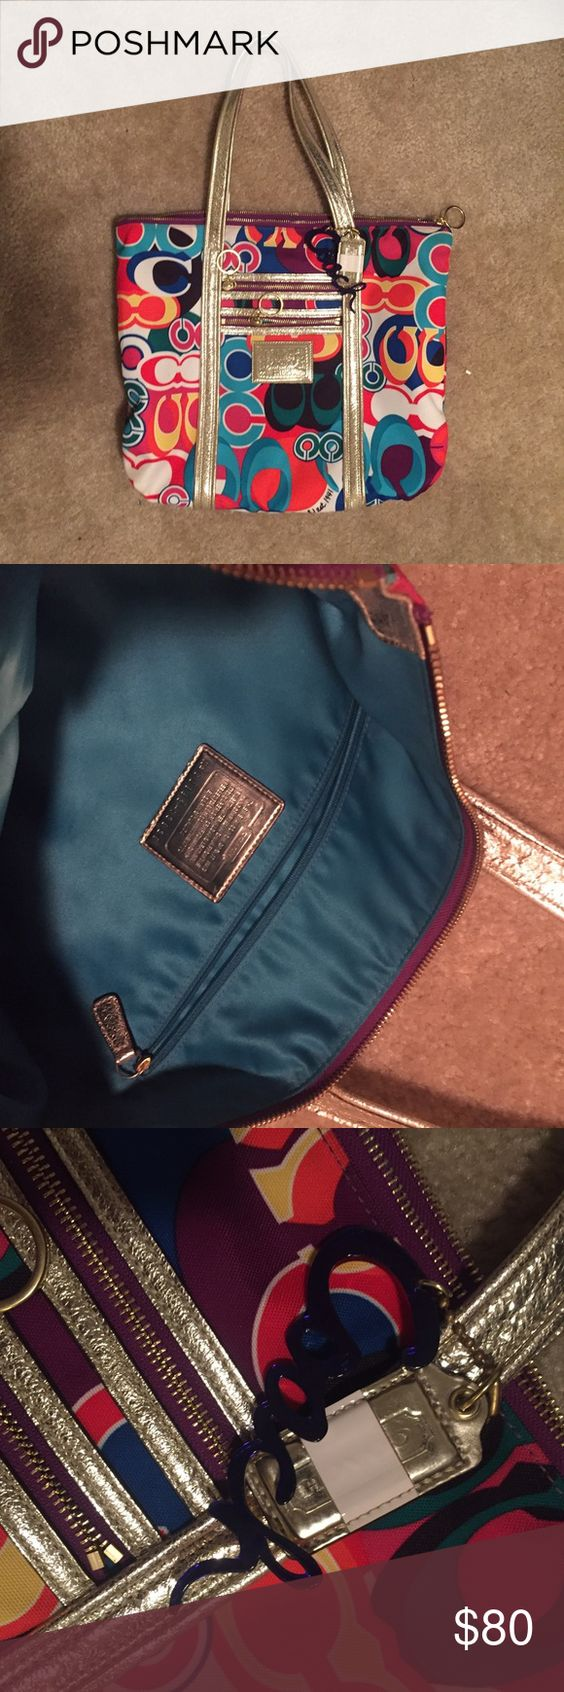 🆕Coach Purse🆕 Poppy Collection Coach Accessories